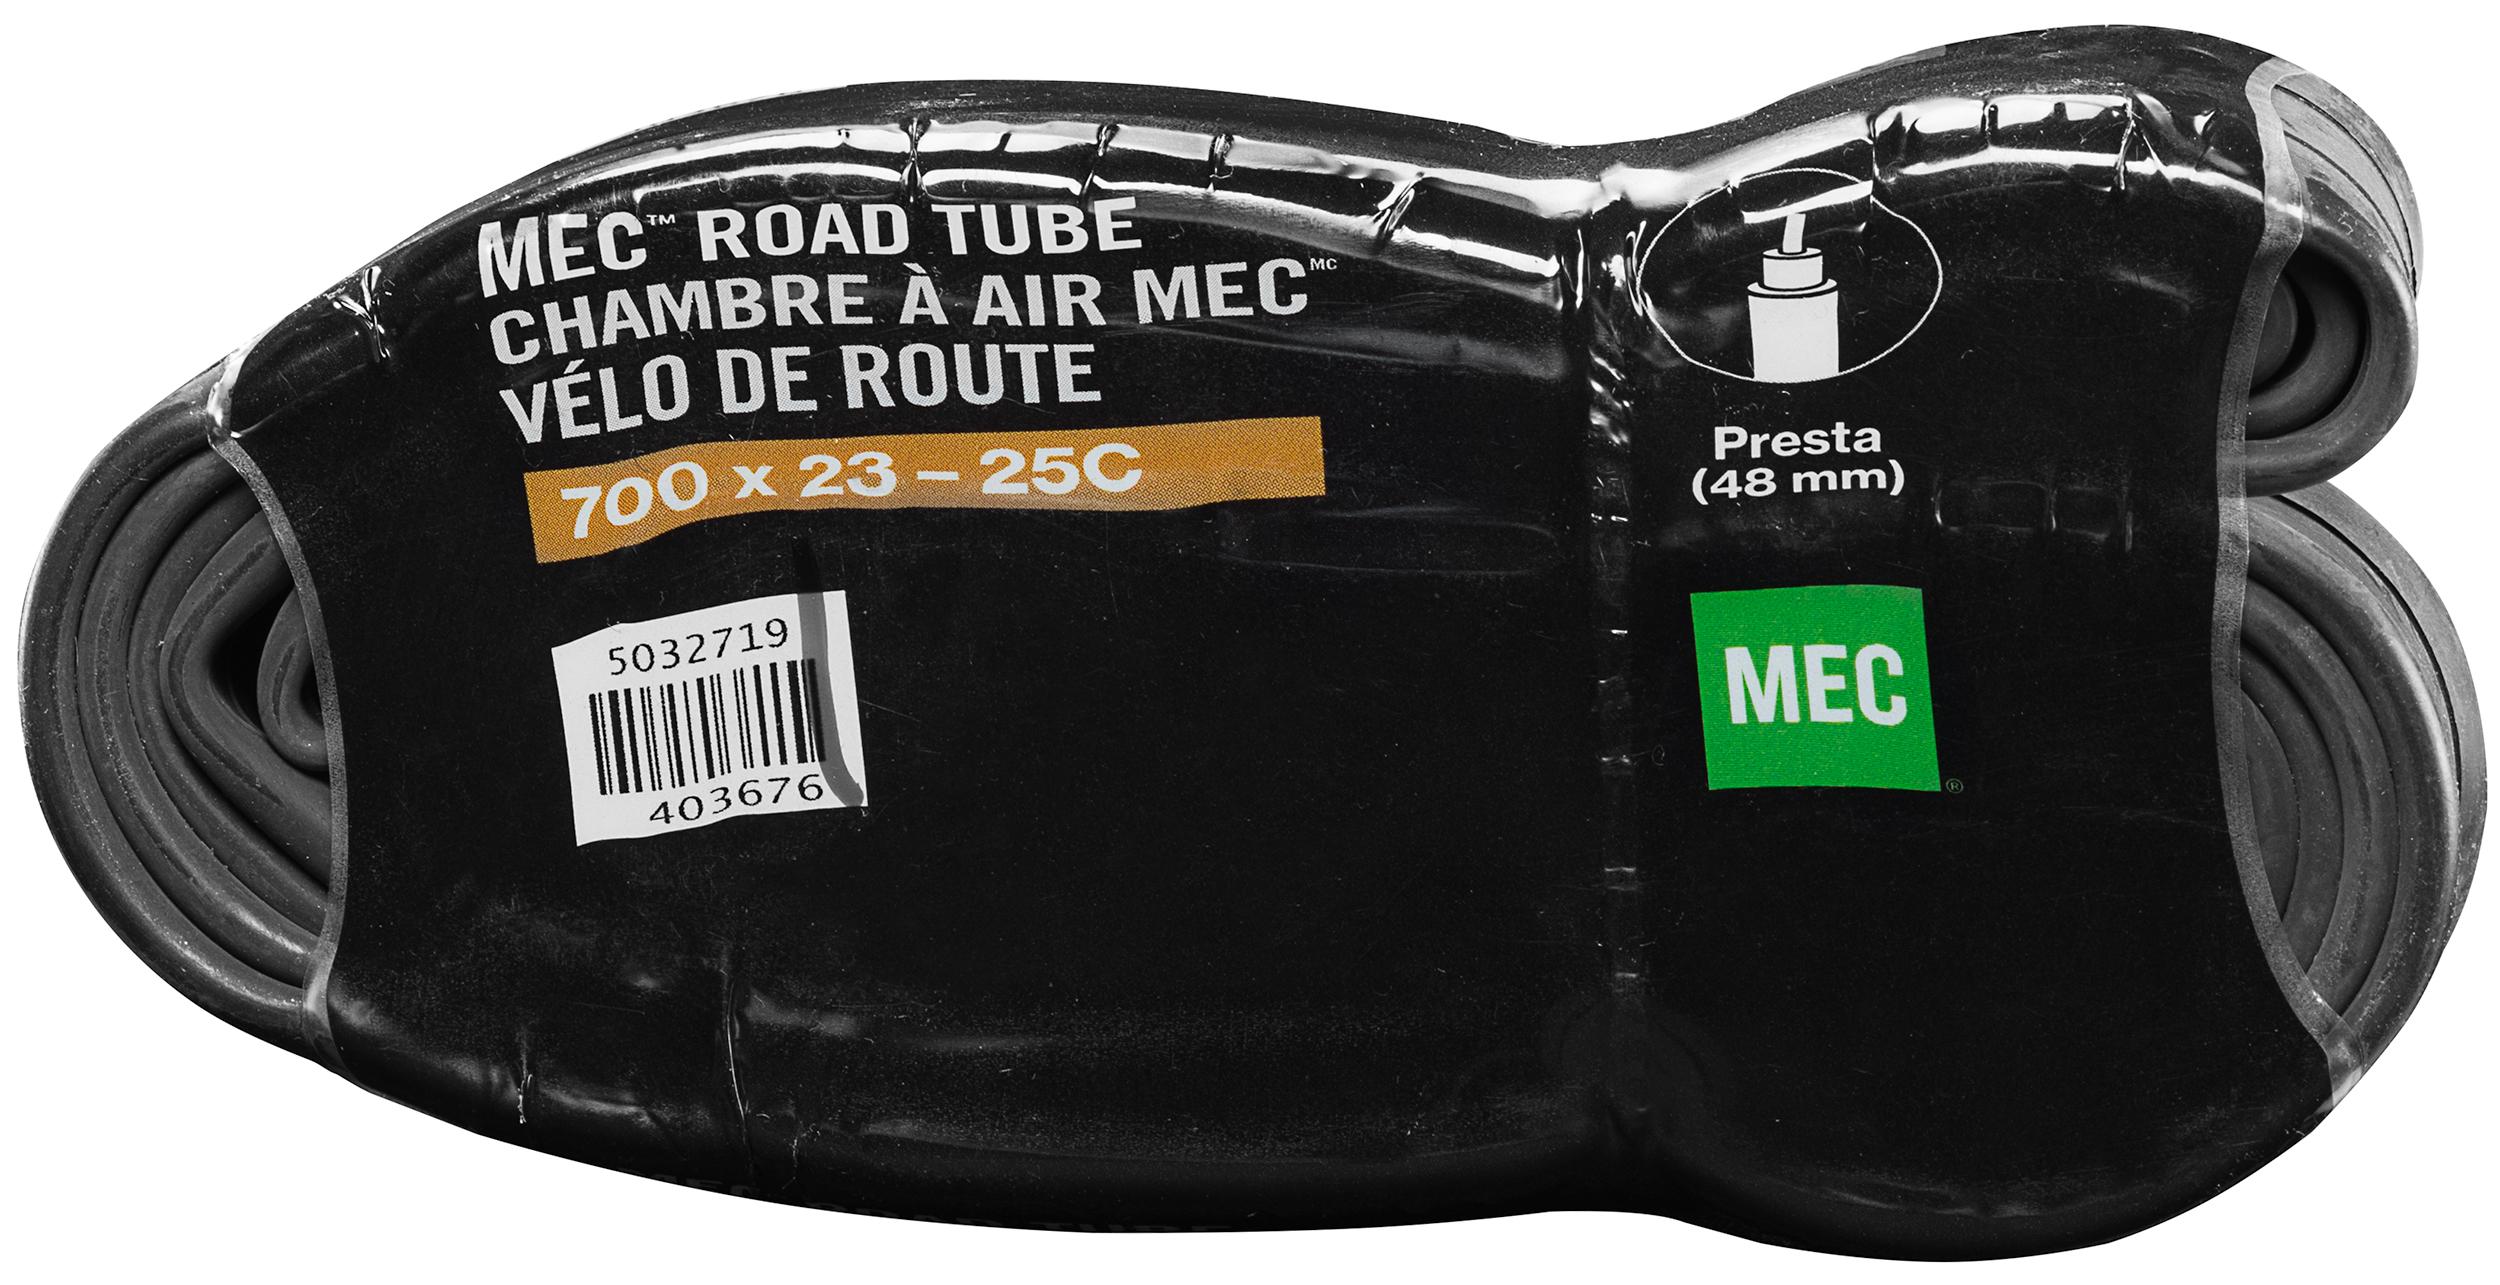 MEC 700 x 23-25C Tube (48mm Presta Valve) Chambre Air X C on